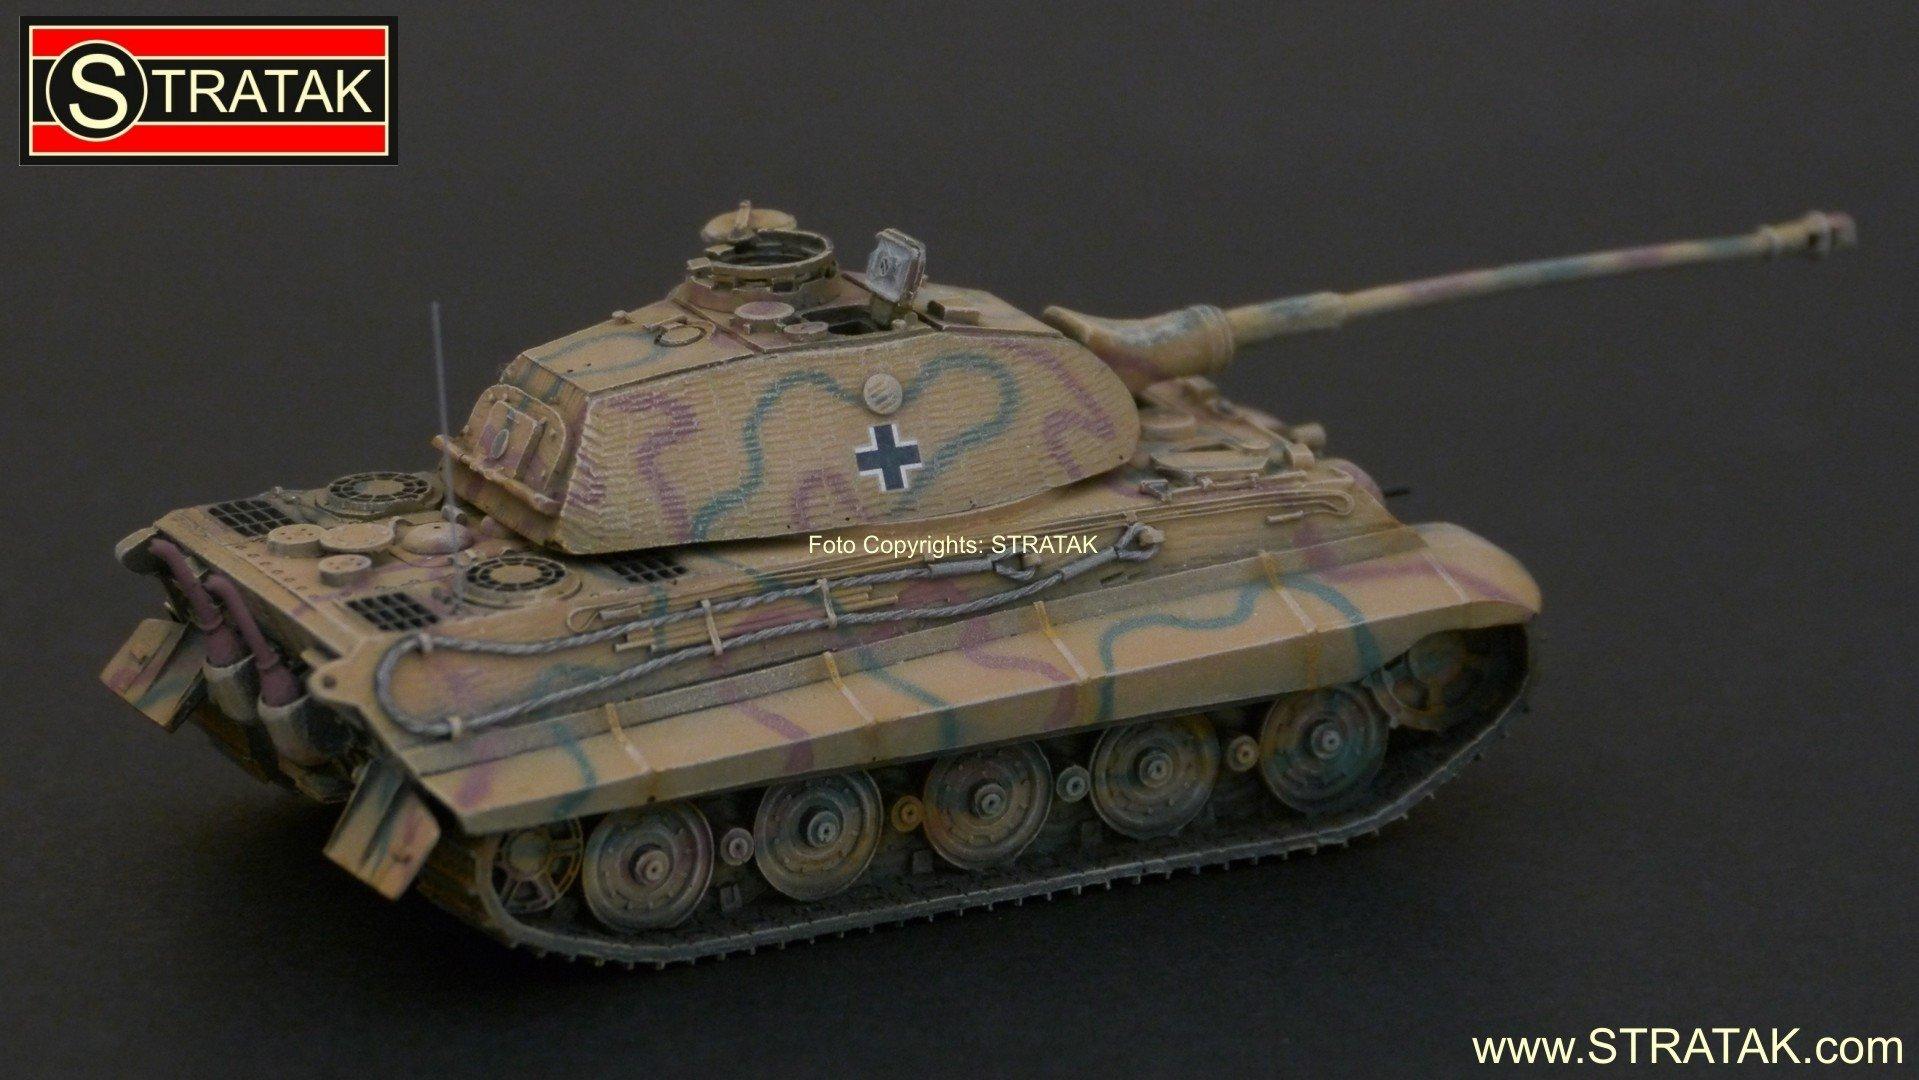 Artitec 387 75 Cm Panzer Vi King Tiger Porsche Zimmerit Camo